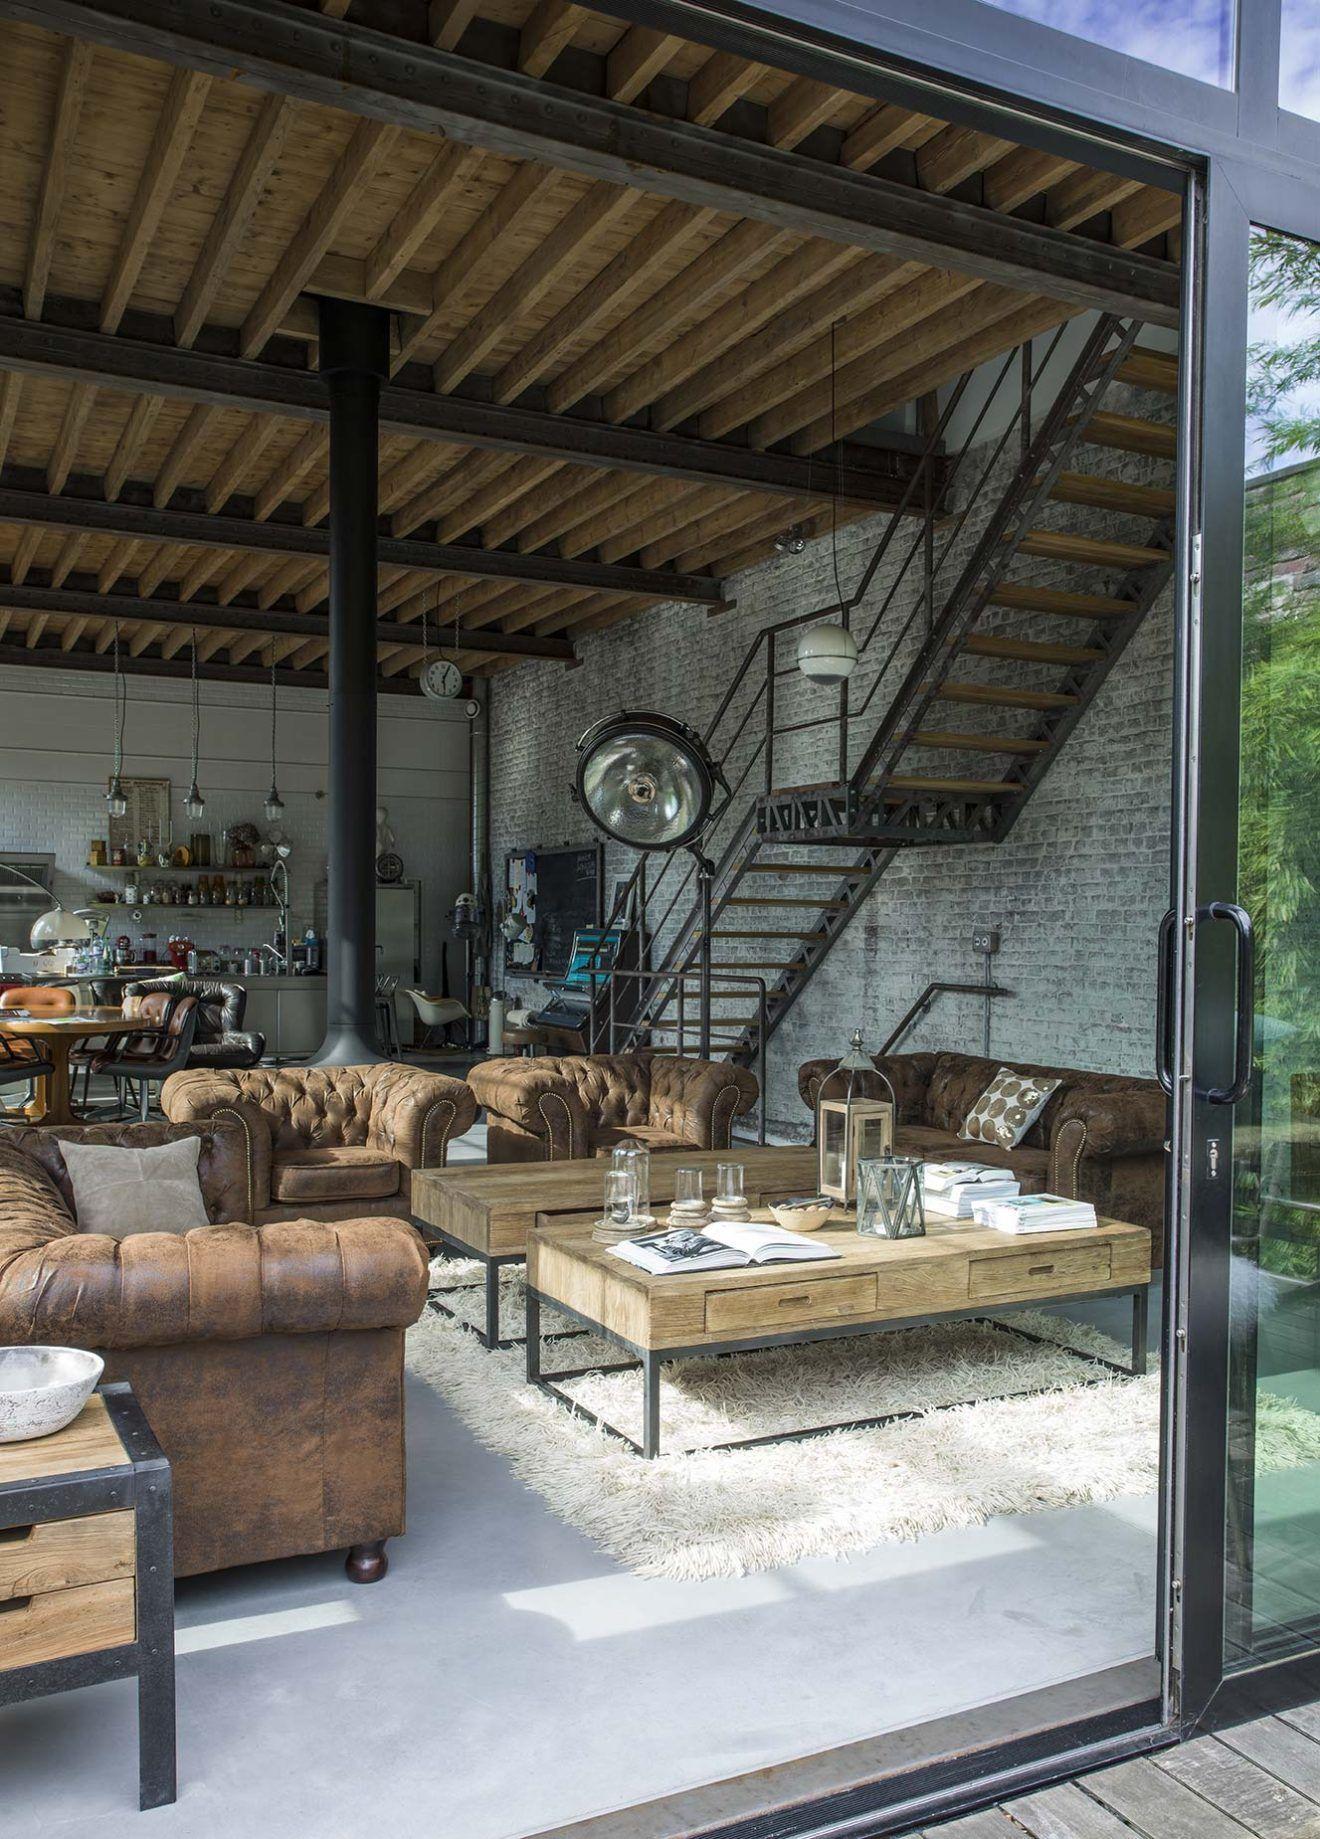 interior 39 s photographie sa collection transition dans un. Black Bedroom Furniture Sets. Home Design Ideas